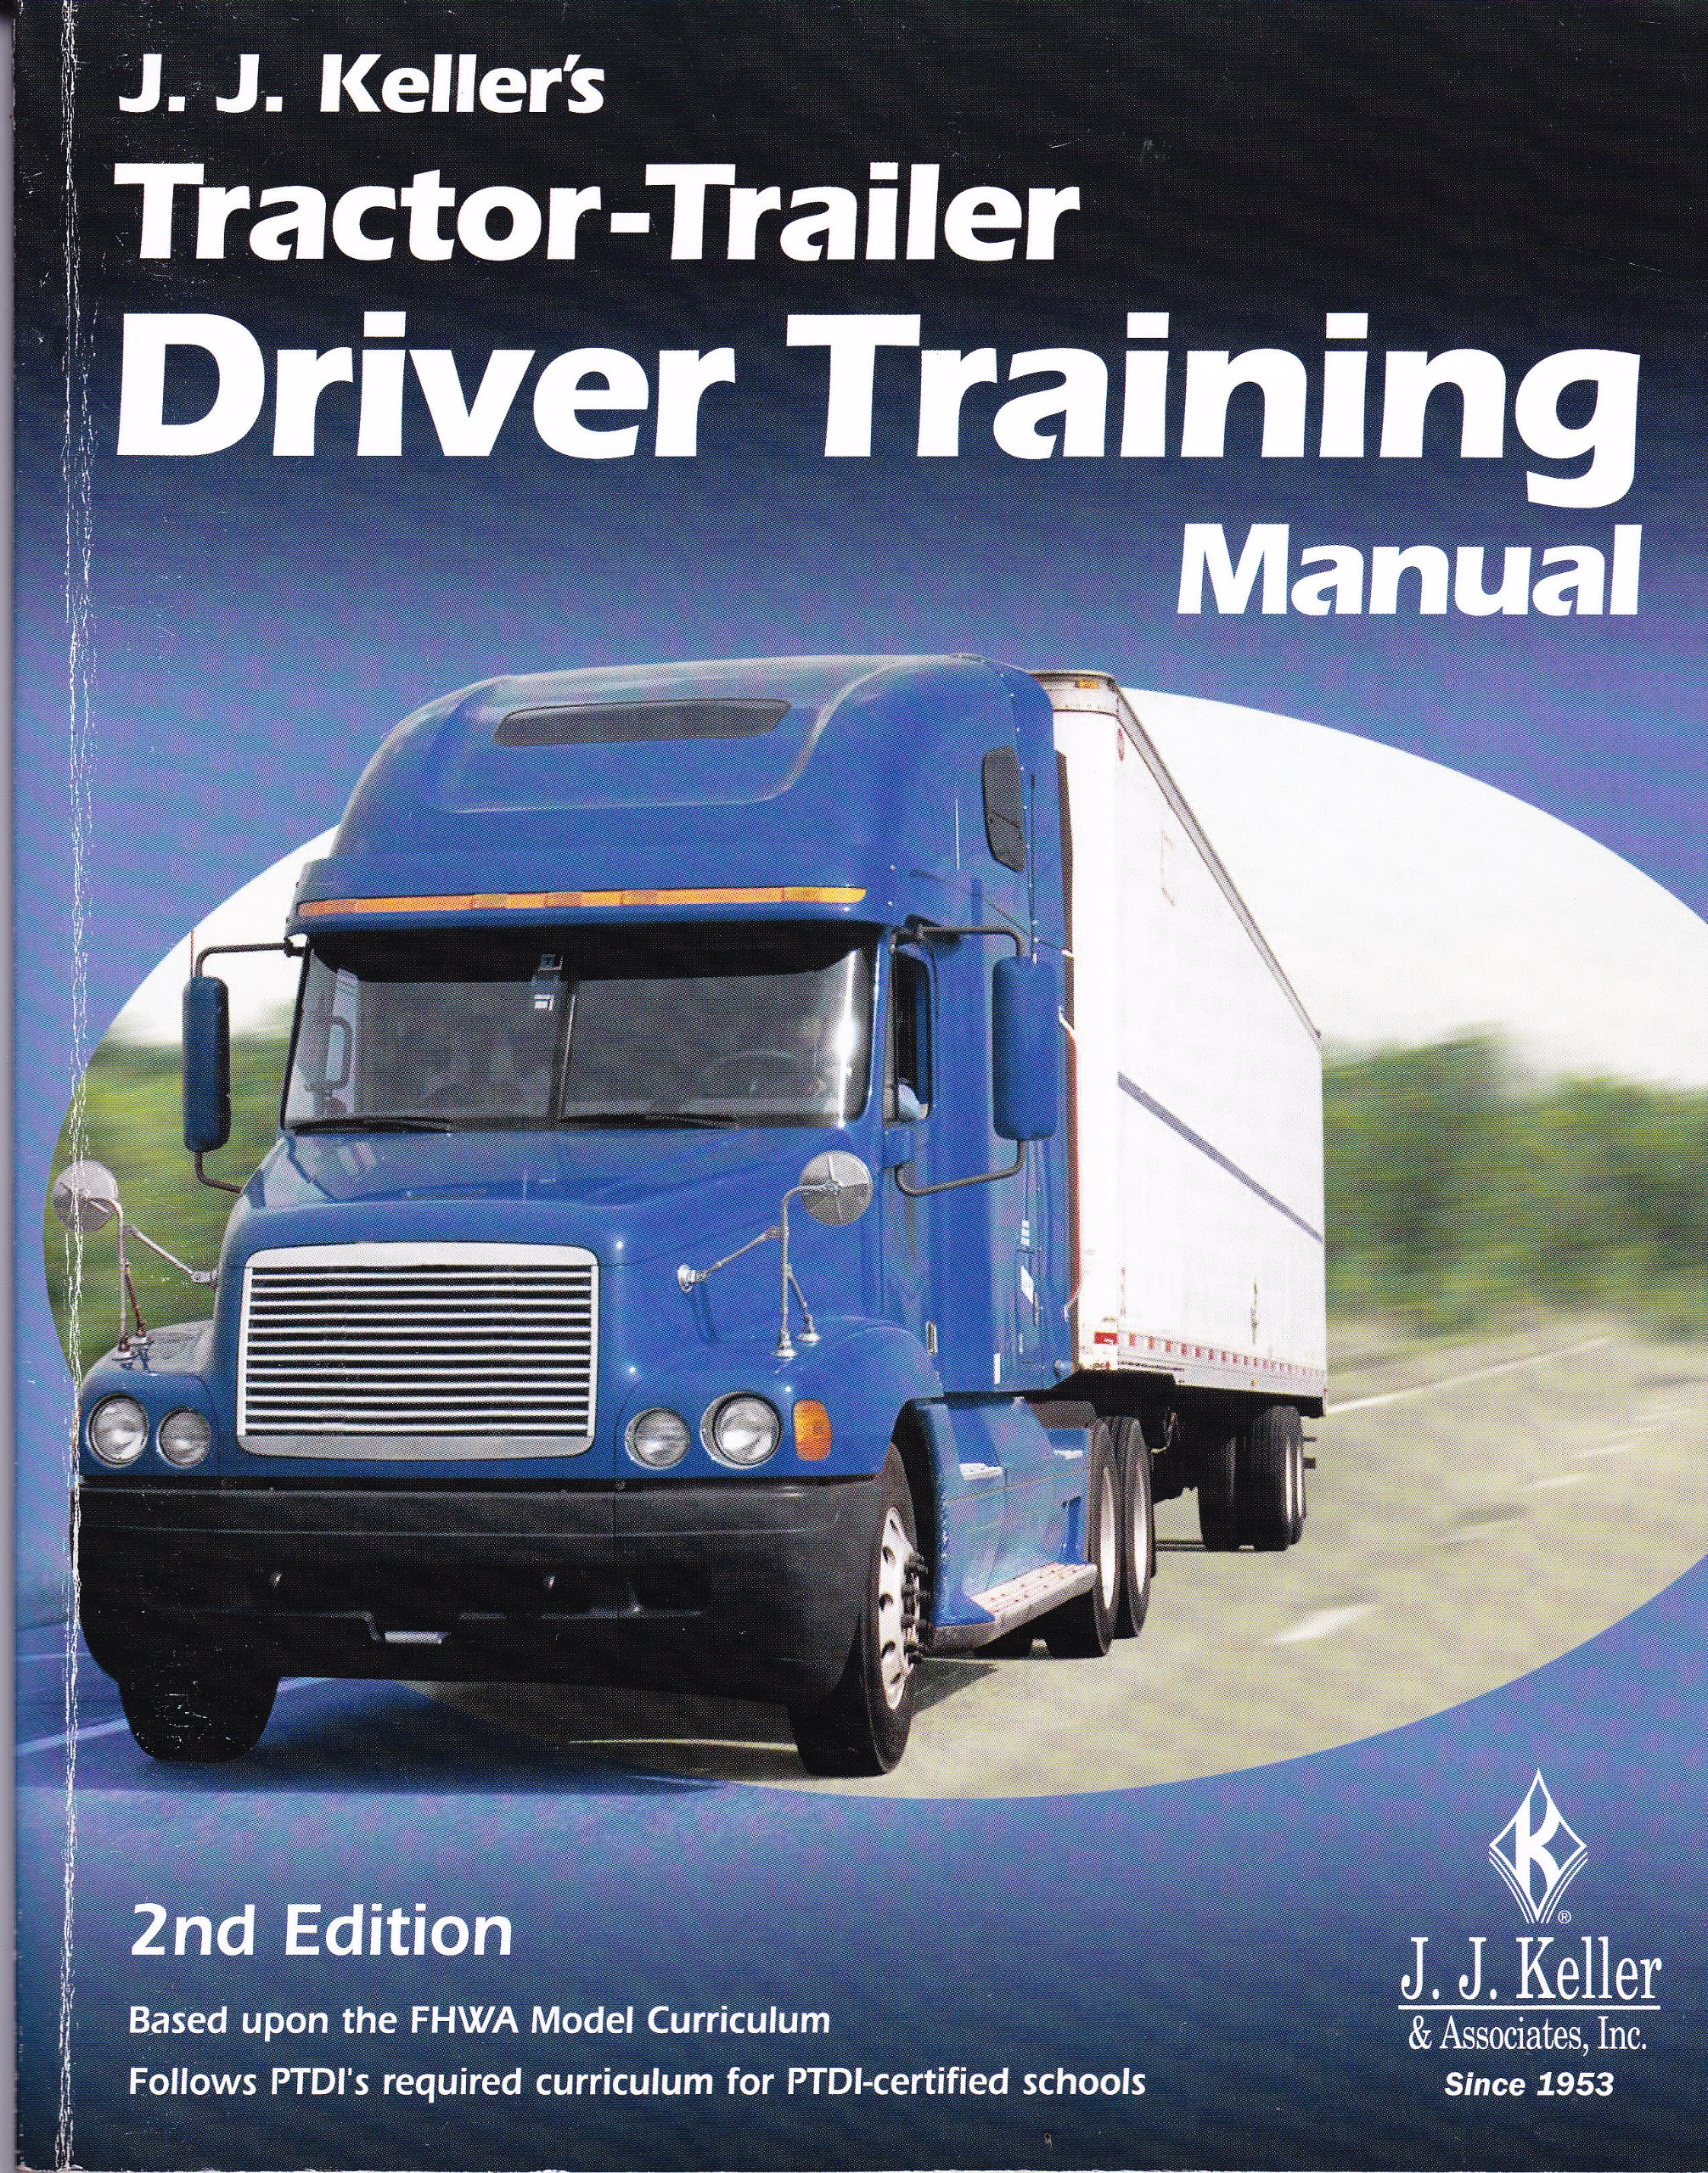 Tractor Trailer Driving Training Manual: J.j. Keller & Associates Staff:  9781602872769: Books - Amazon.ca